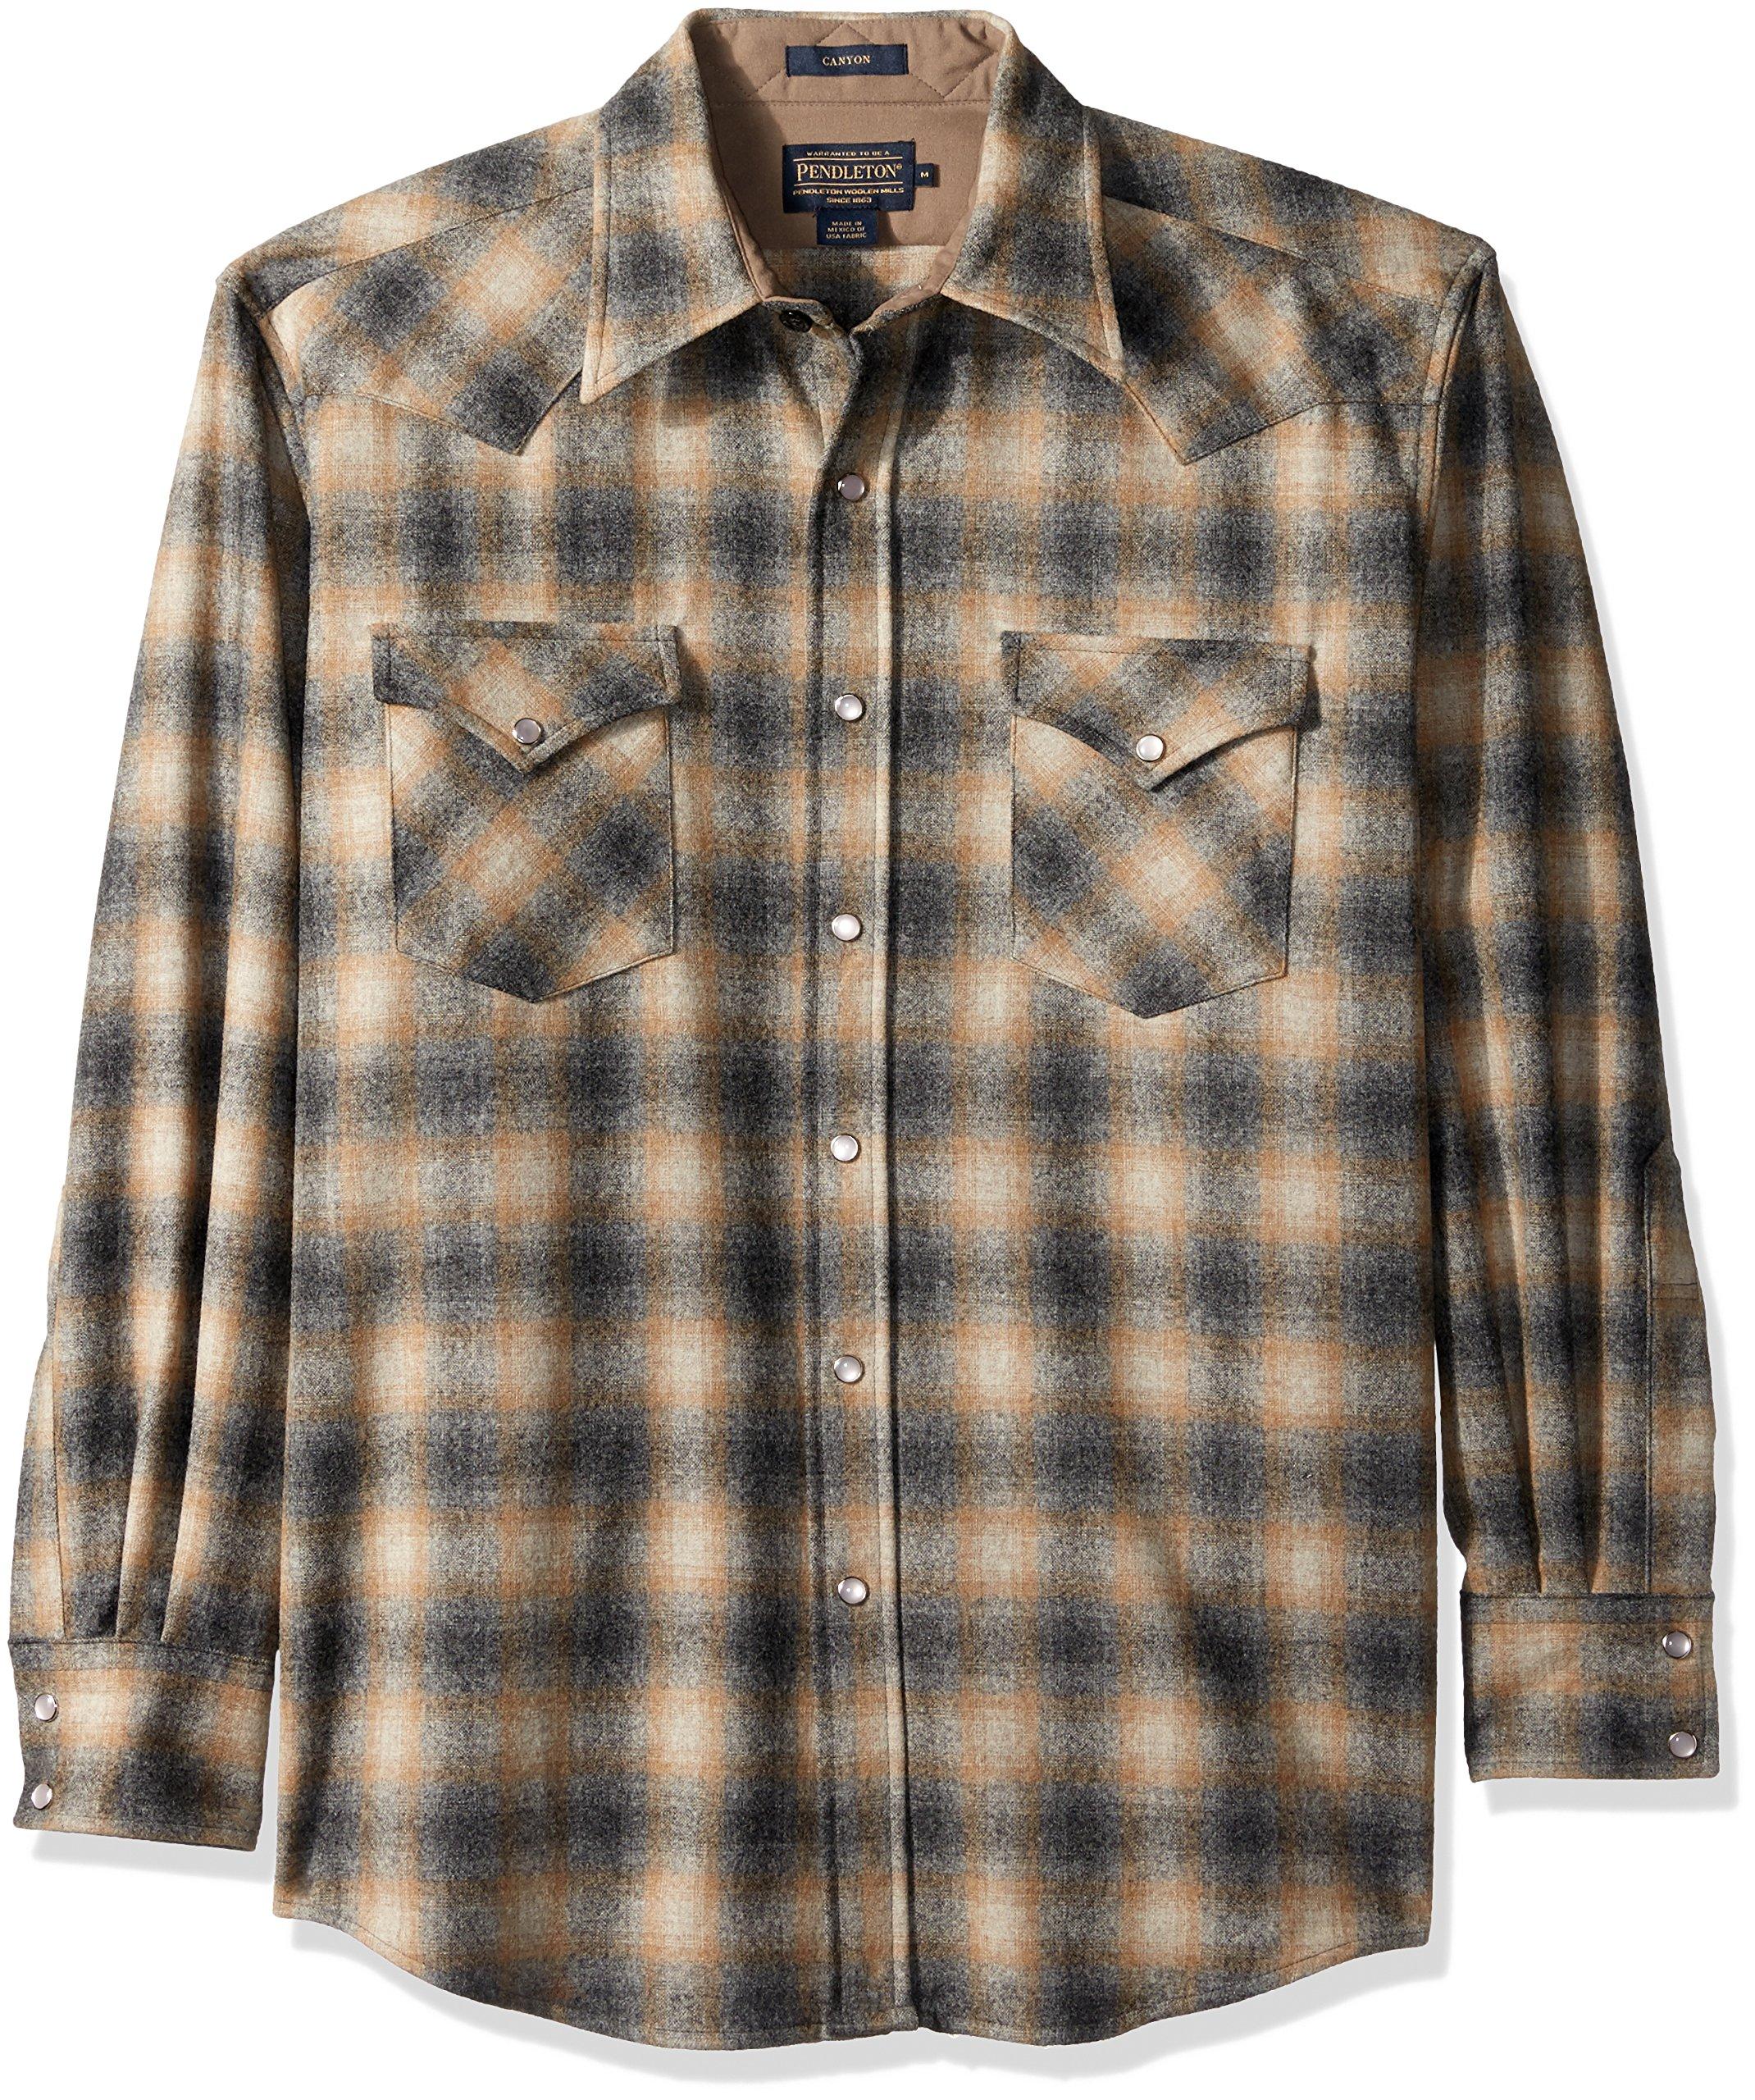 Pendleton Men's Long Sleeve Button Front Classic-fit Canyon Shirt, Oxford Grey/Tan Ombre-31942, XL